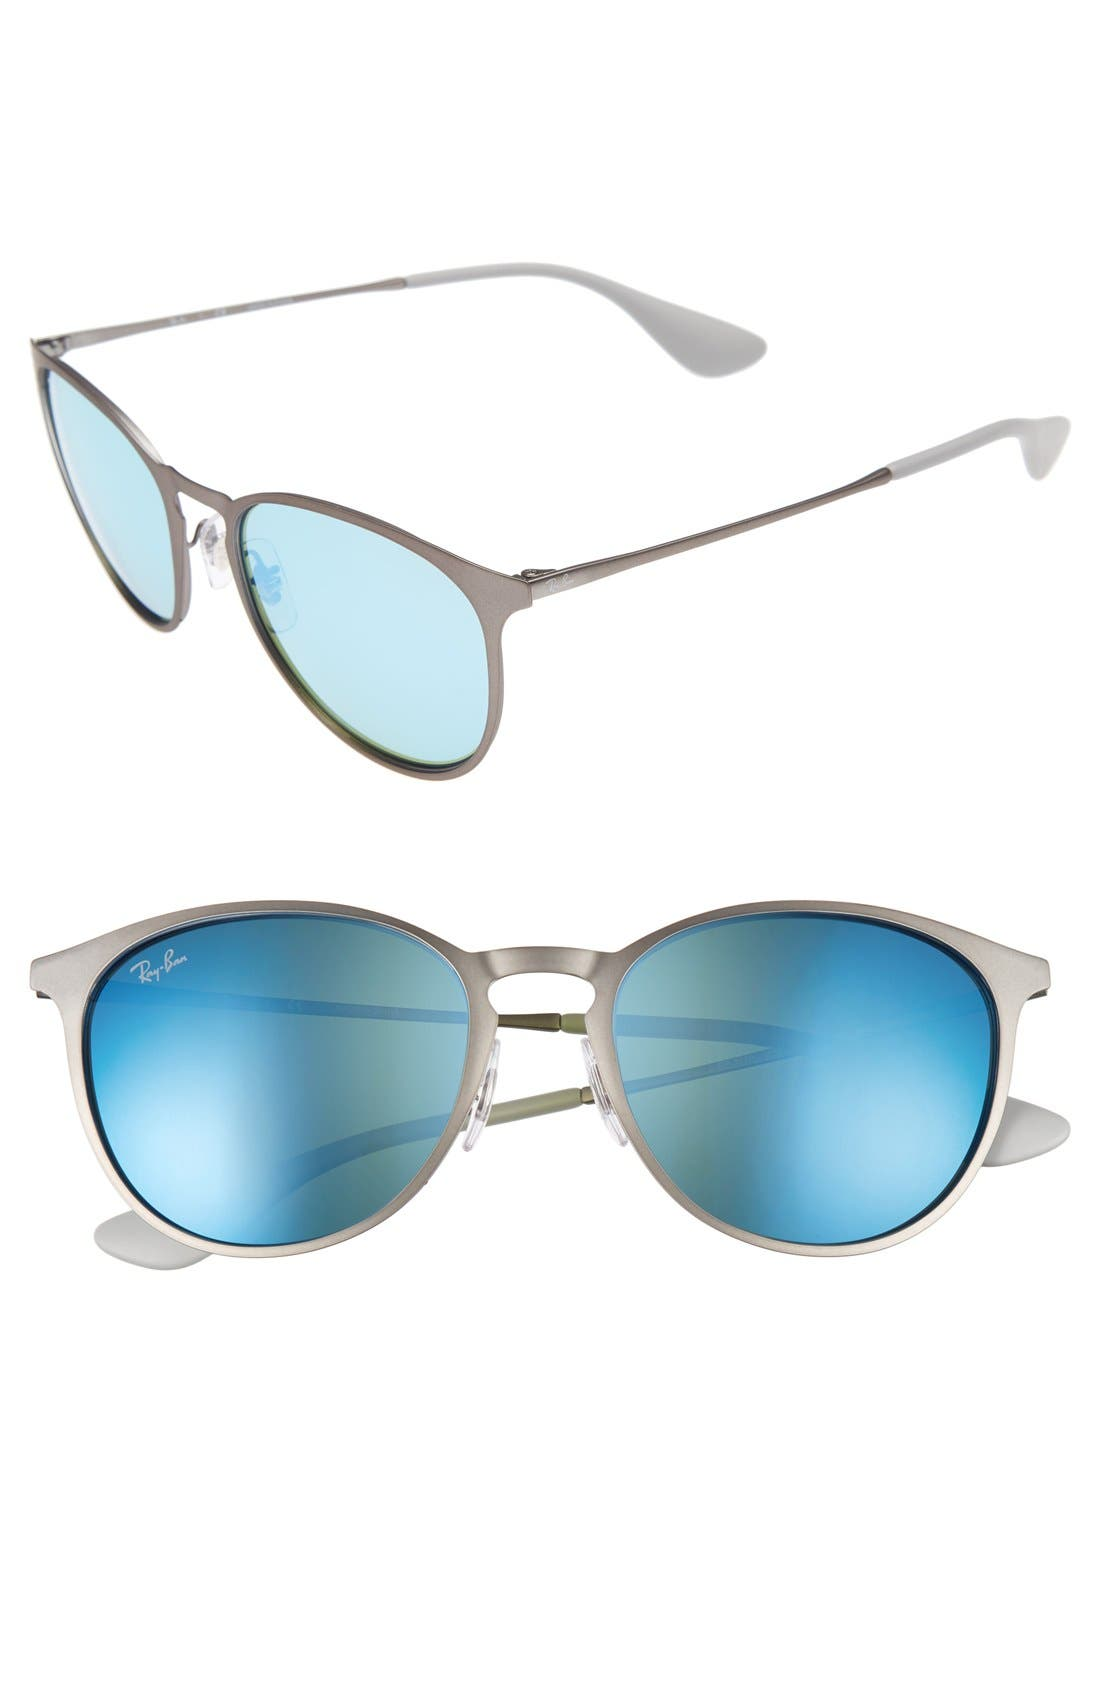 Highstreet 54mm Sunglasses,                             Main thumbnail 1, color,                             300